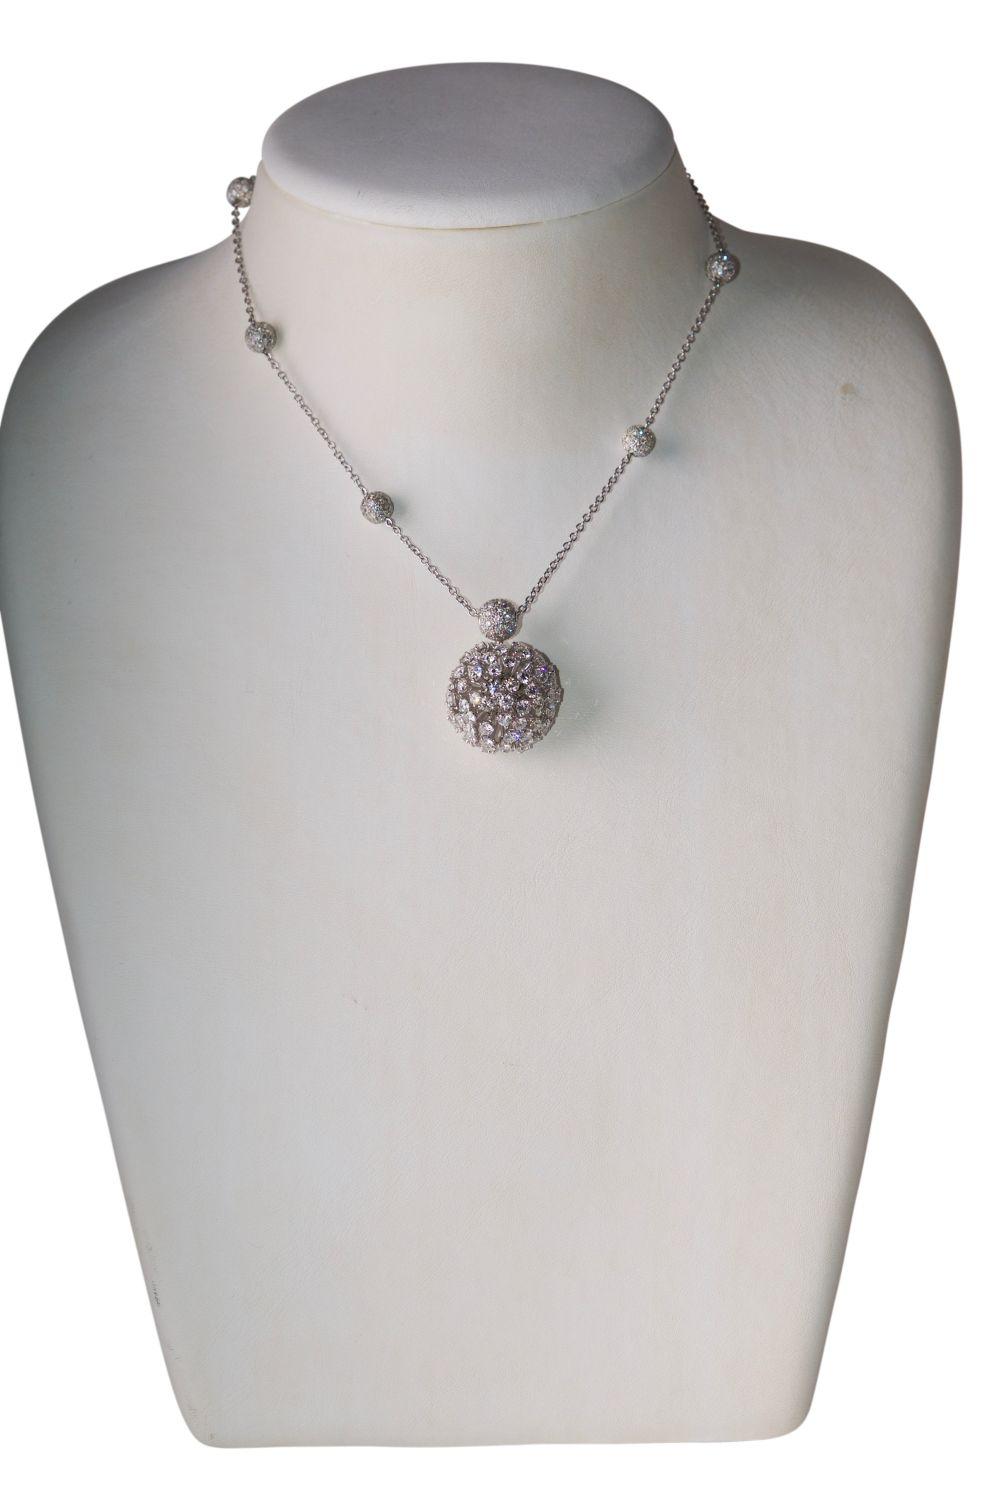 #119 Brillant-Necklace | Brillant-Collier Image